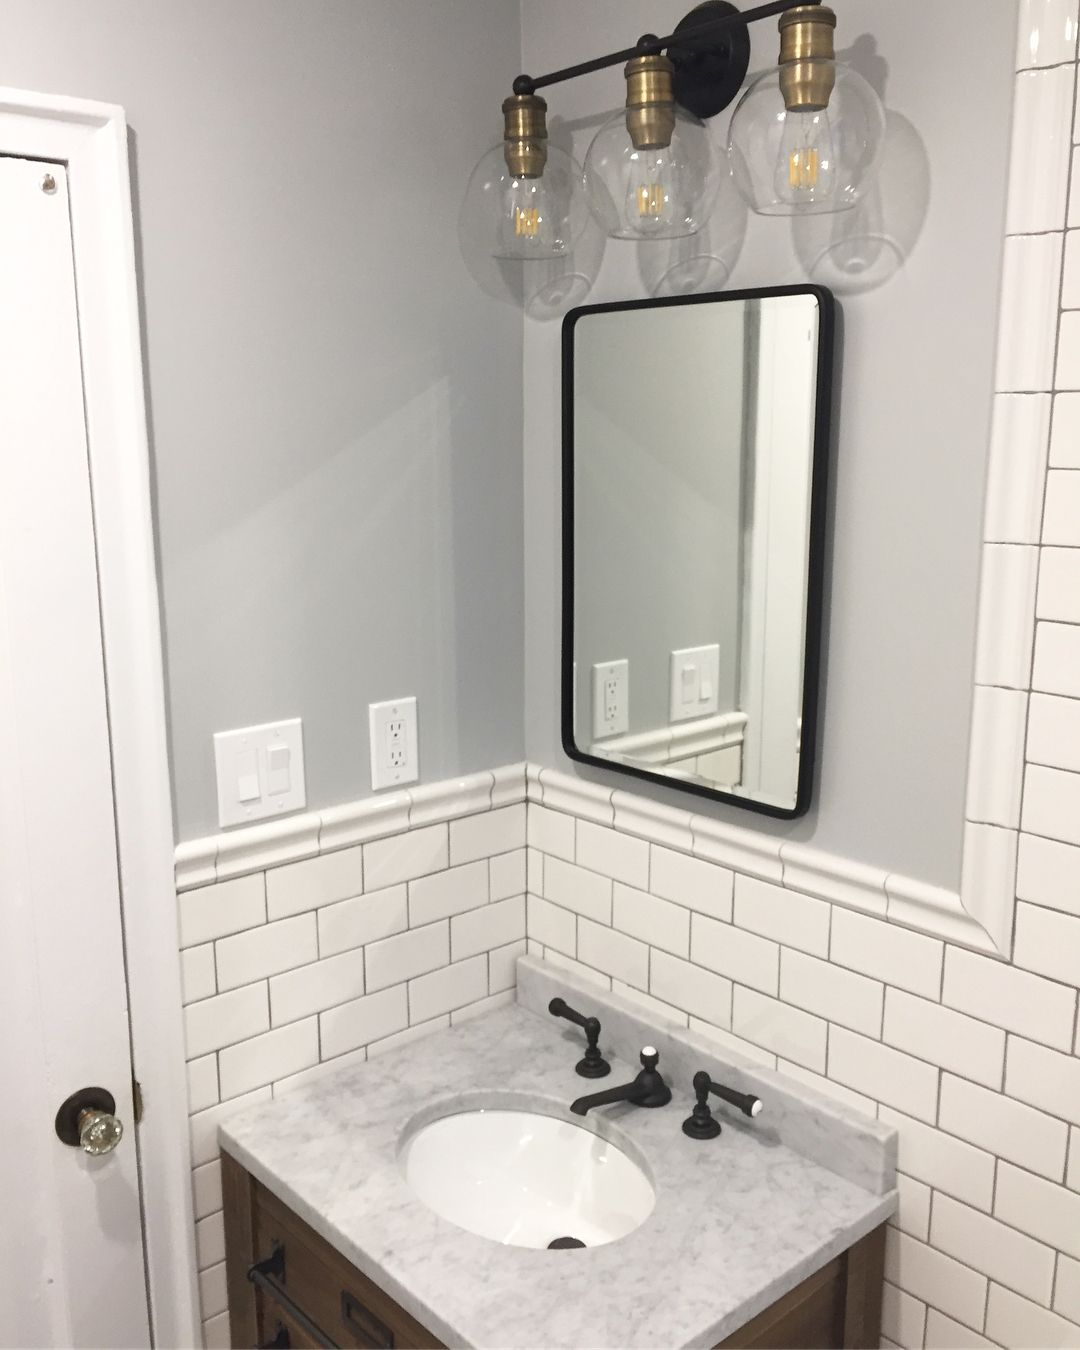 Farmhouse Bathroom White Subway Tile With Gray Grout